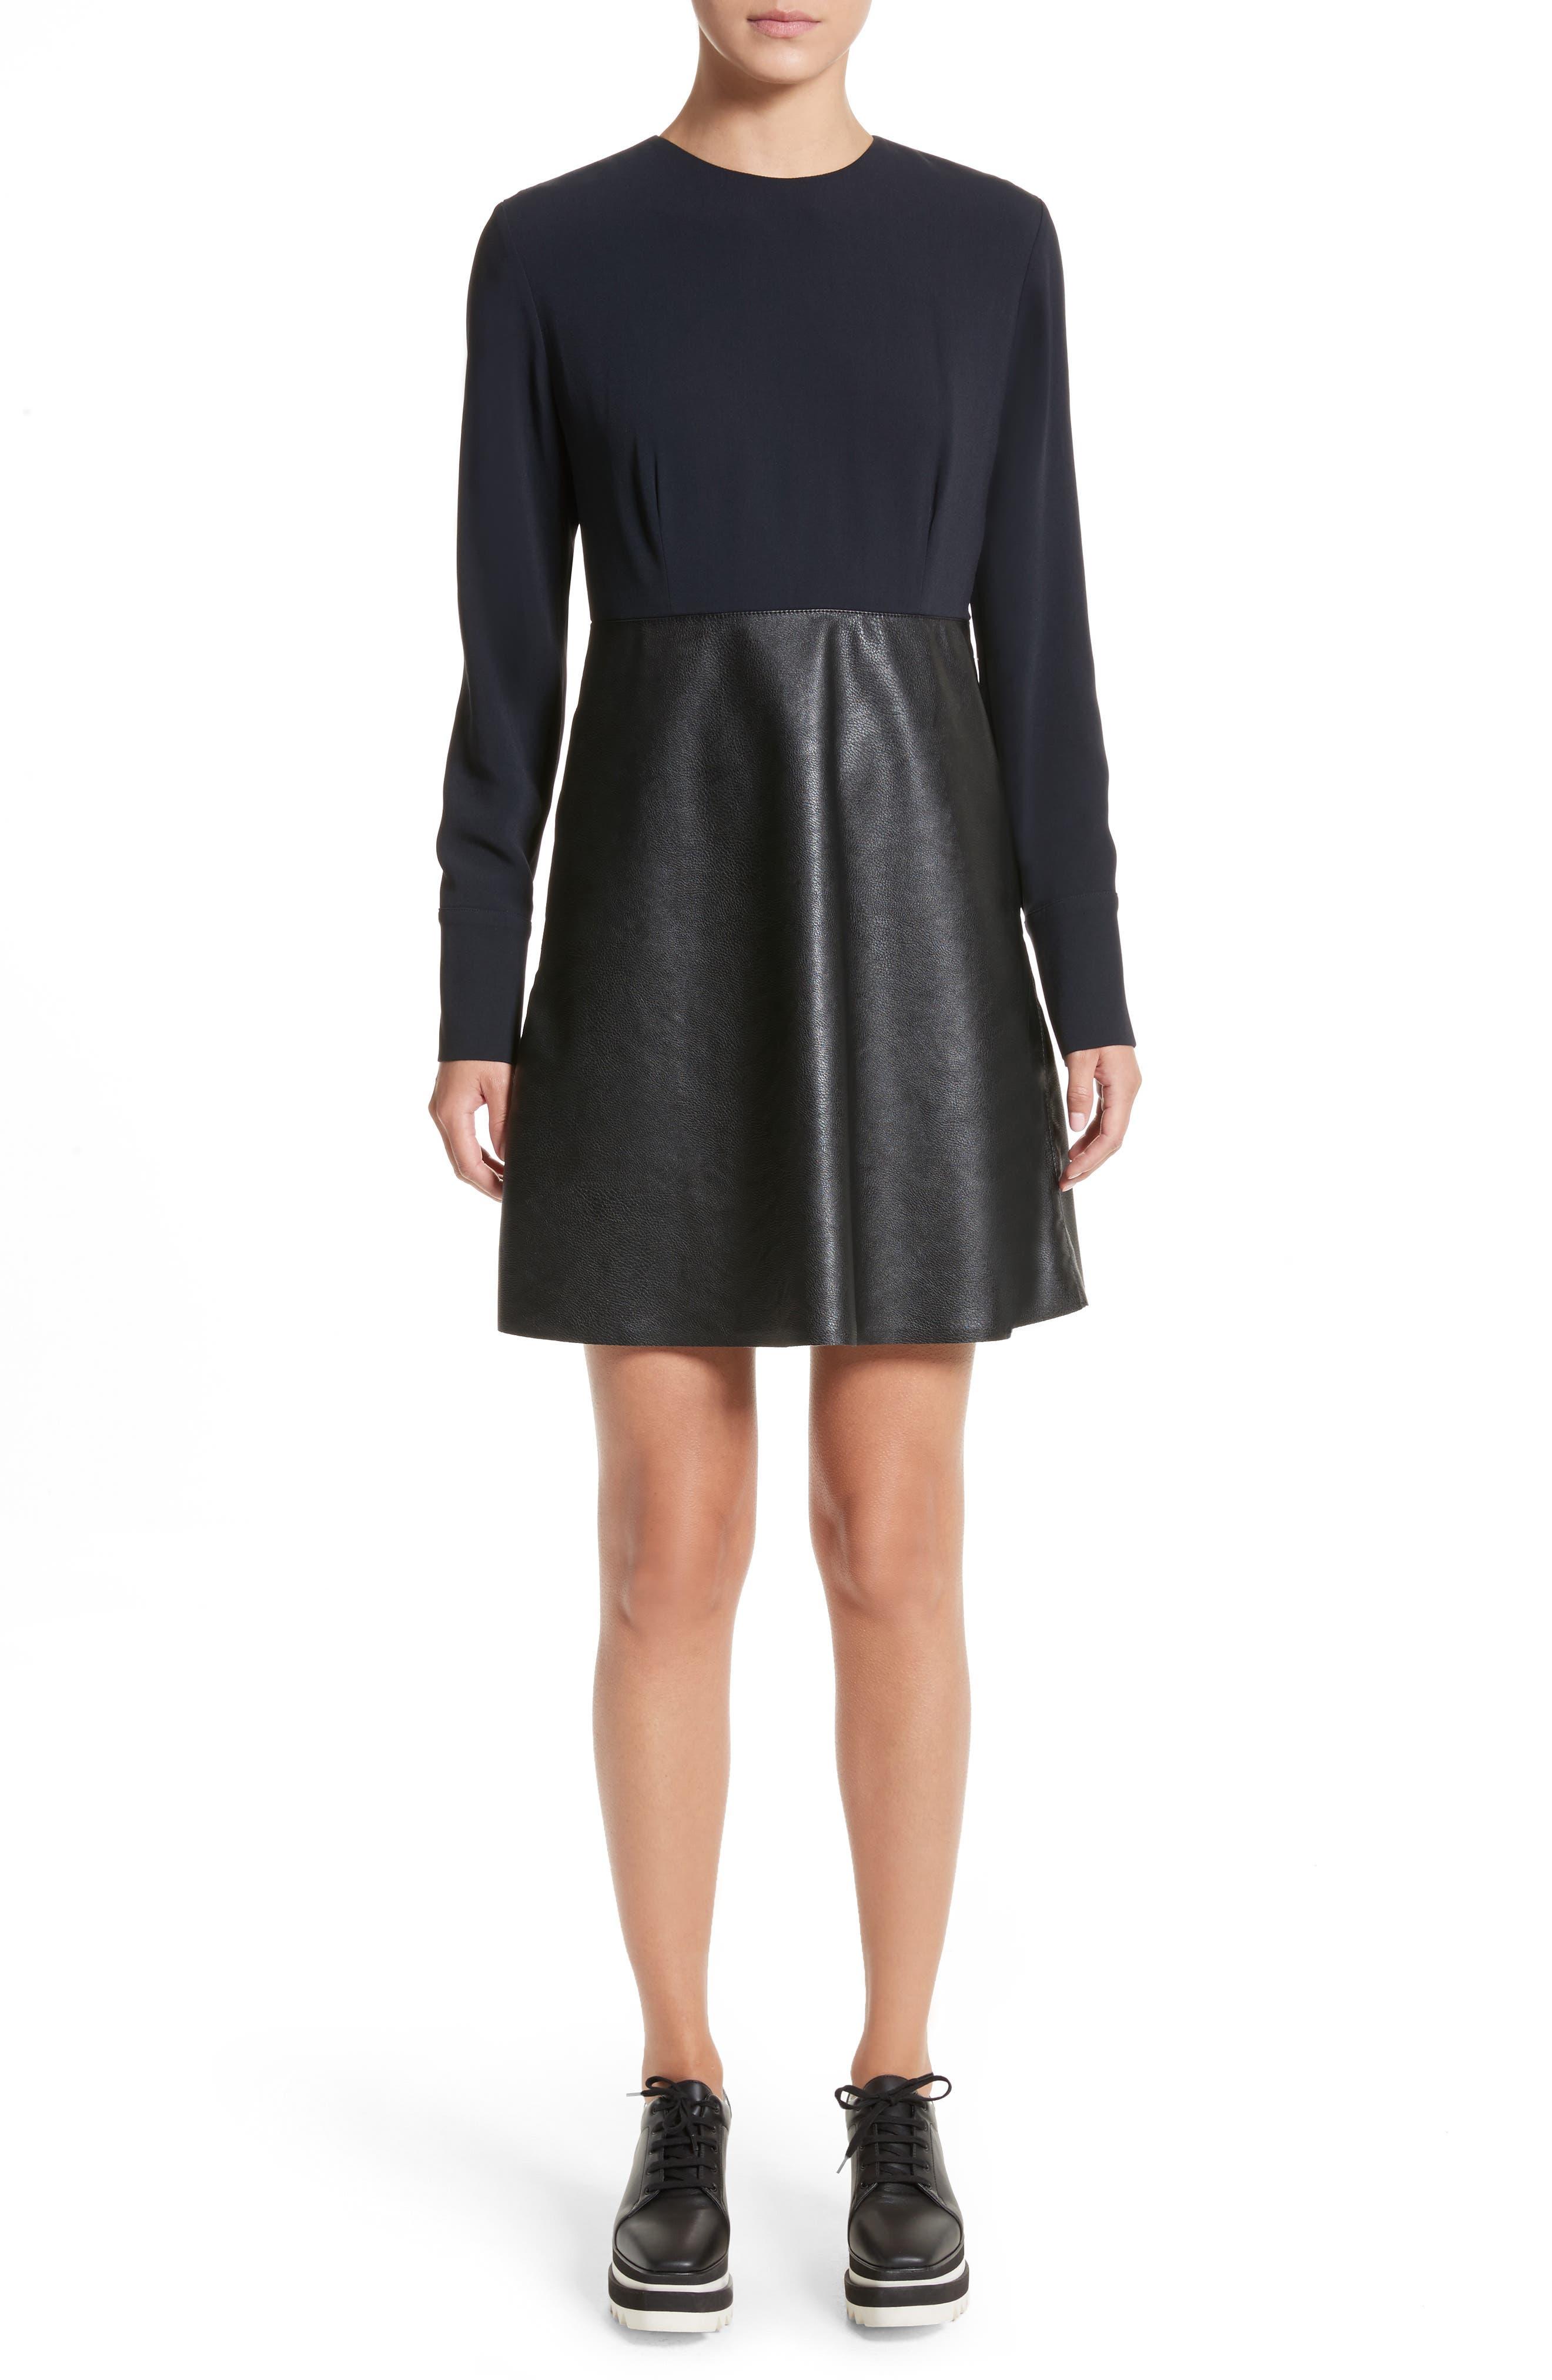 Stella McCartney Alter Leather & Stretch Cady Dress